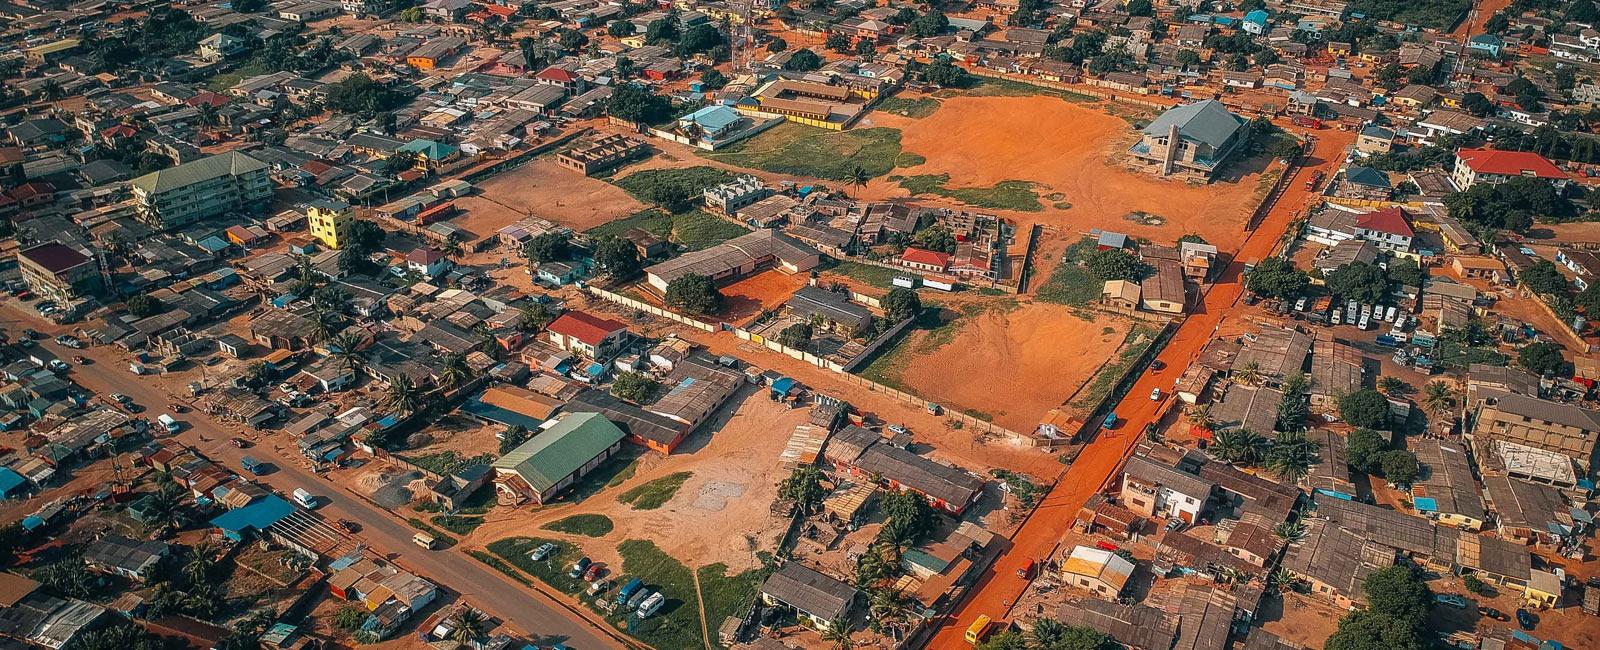 Guaranteeing Organic in Ghana During a Pandemic